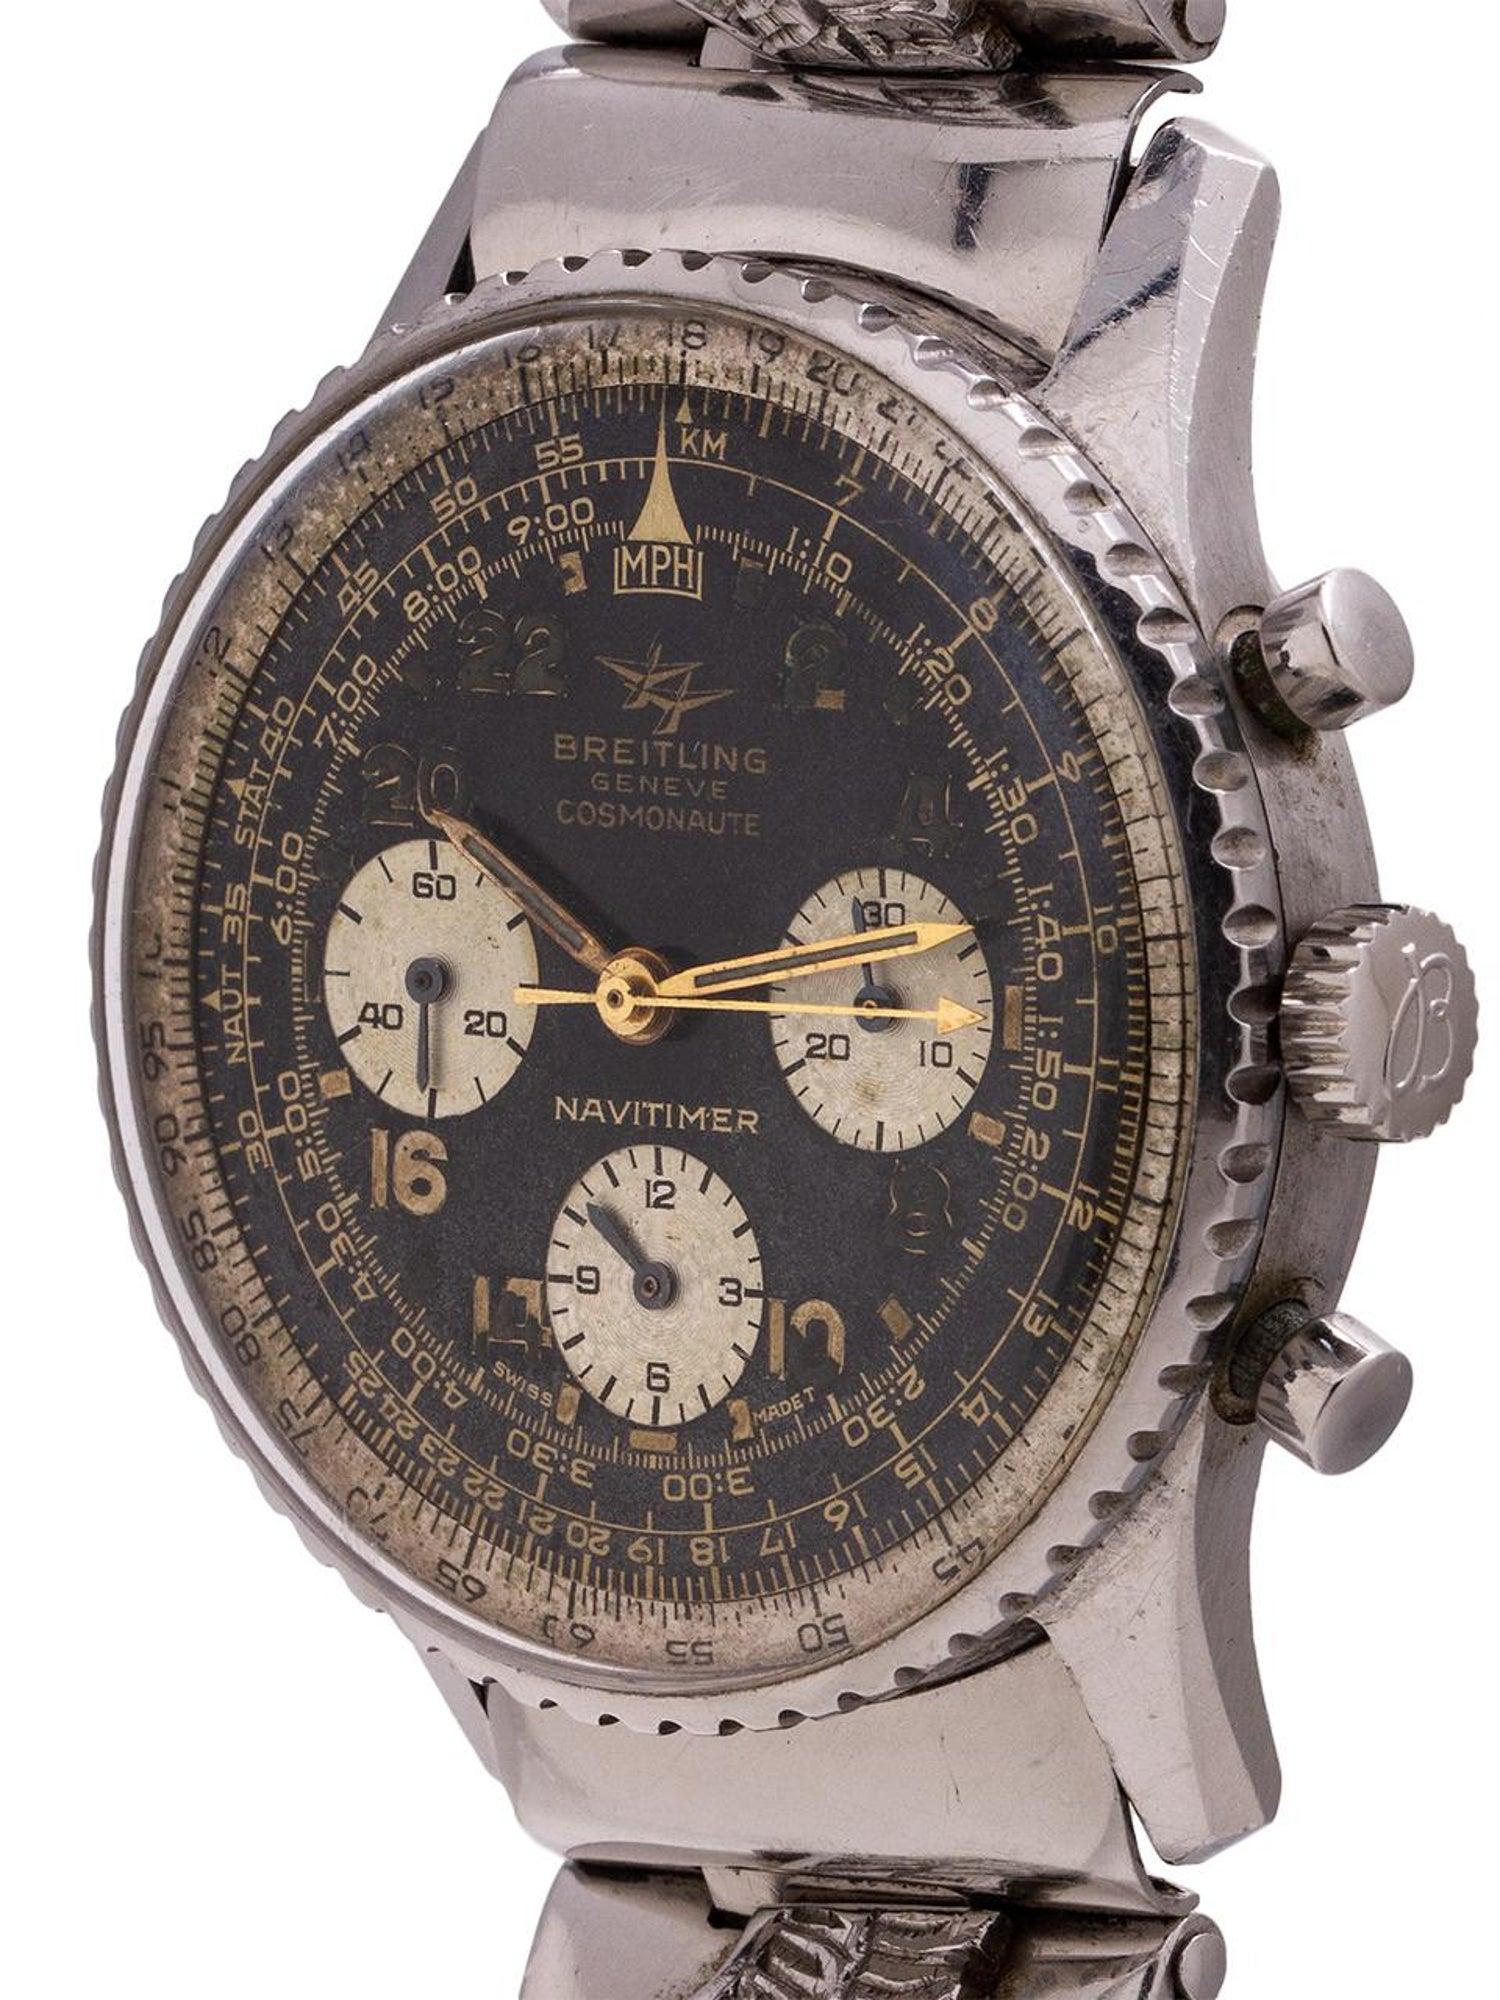 Breitling Stainless Steel Navitimer Cosmonaute Manual Wristwatch Ref 806 C 1965